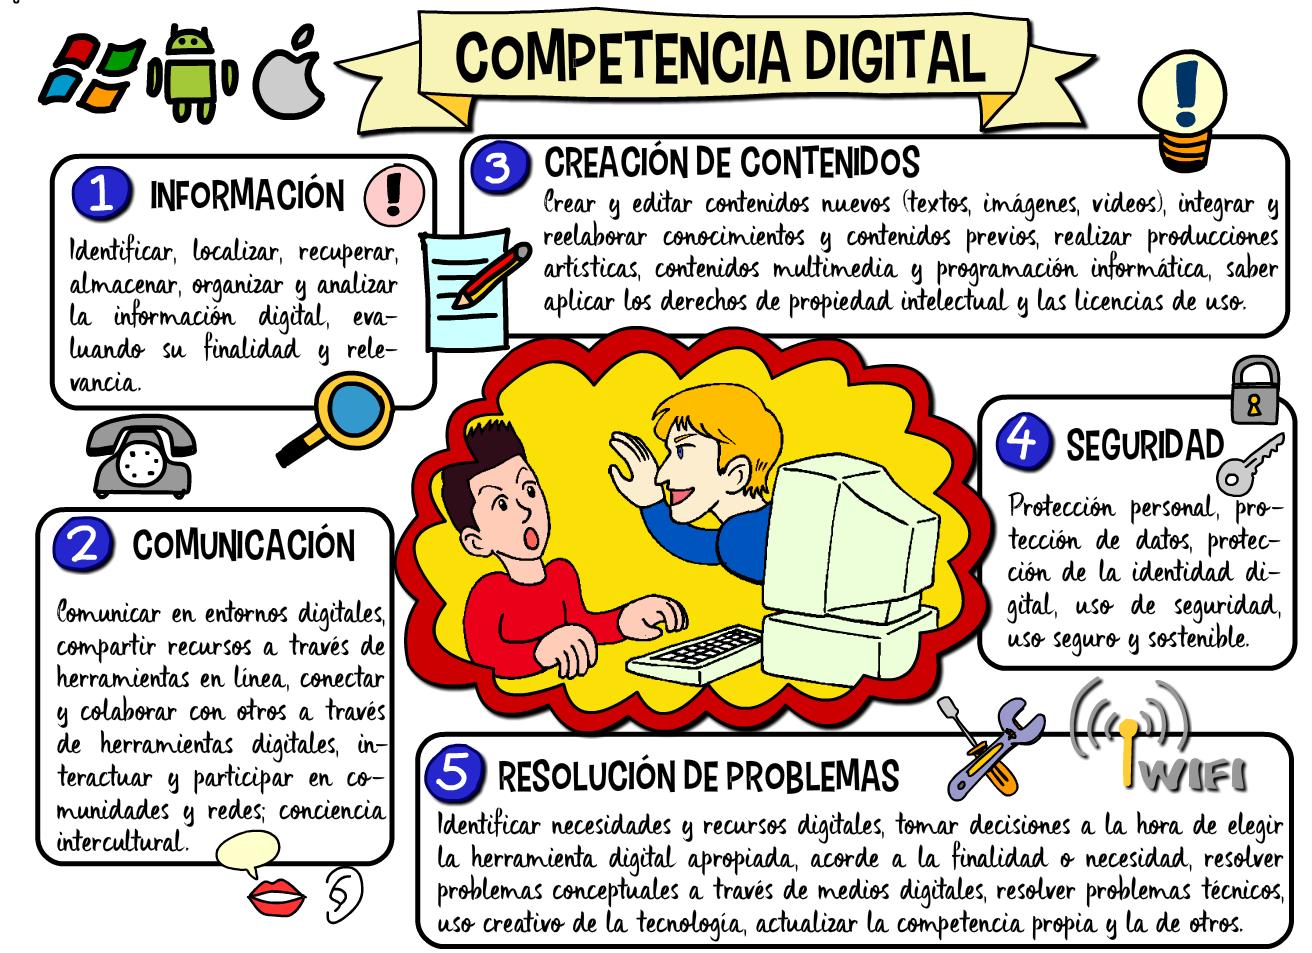 competencia digital11